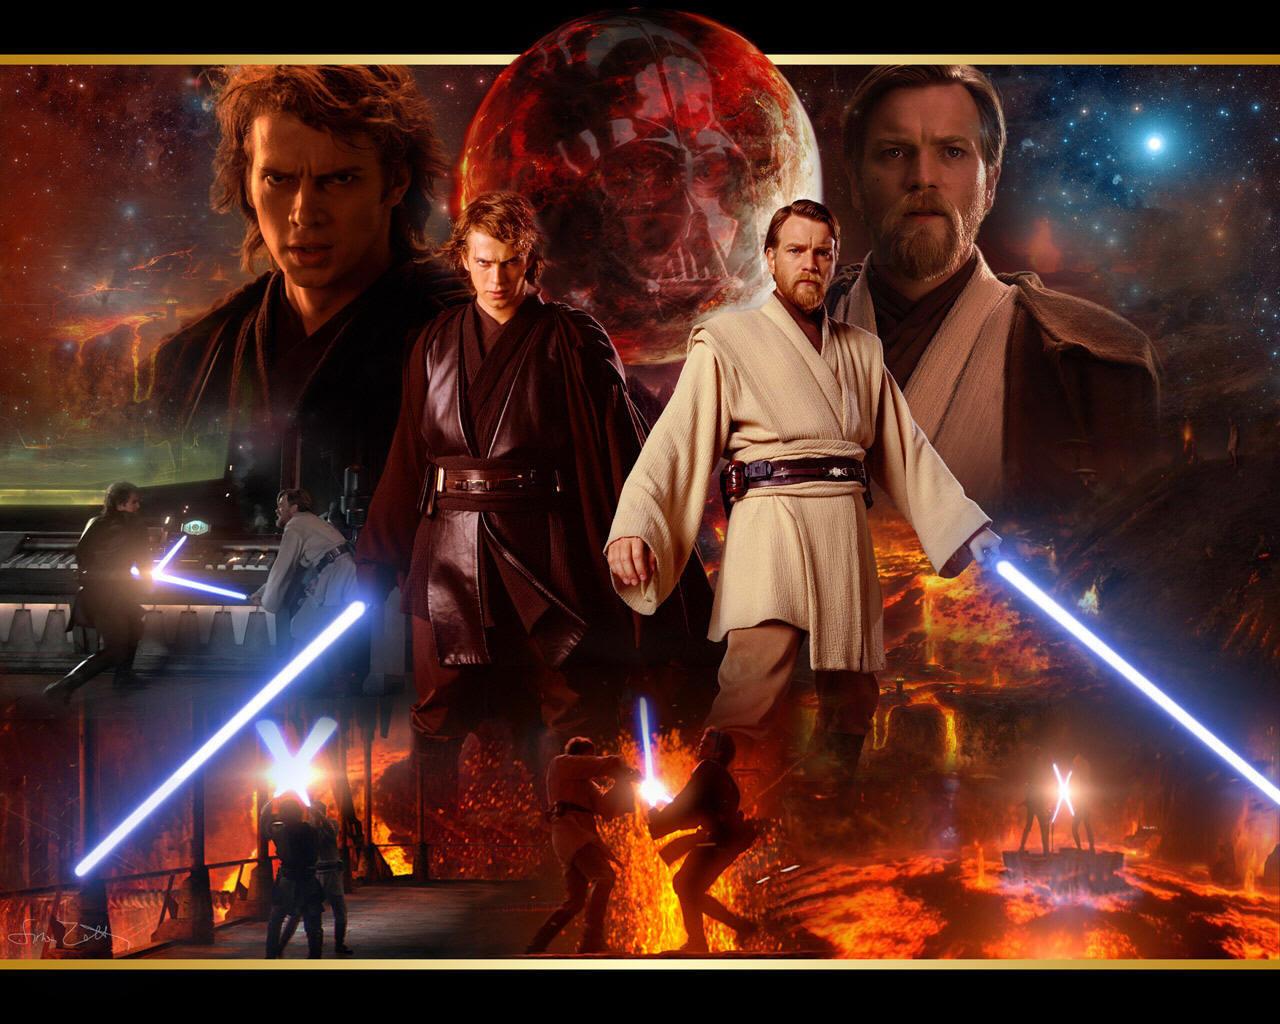 Anakin And Obi Wan Star Wars Revenge Of The Sith Wallpaper